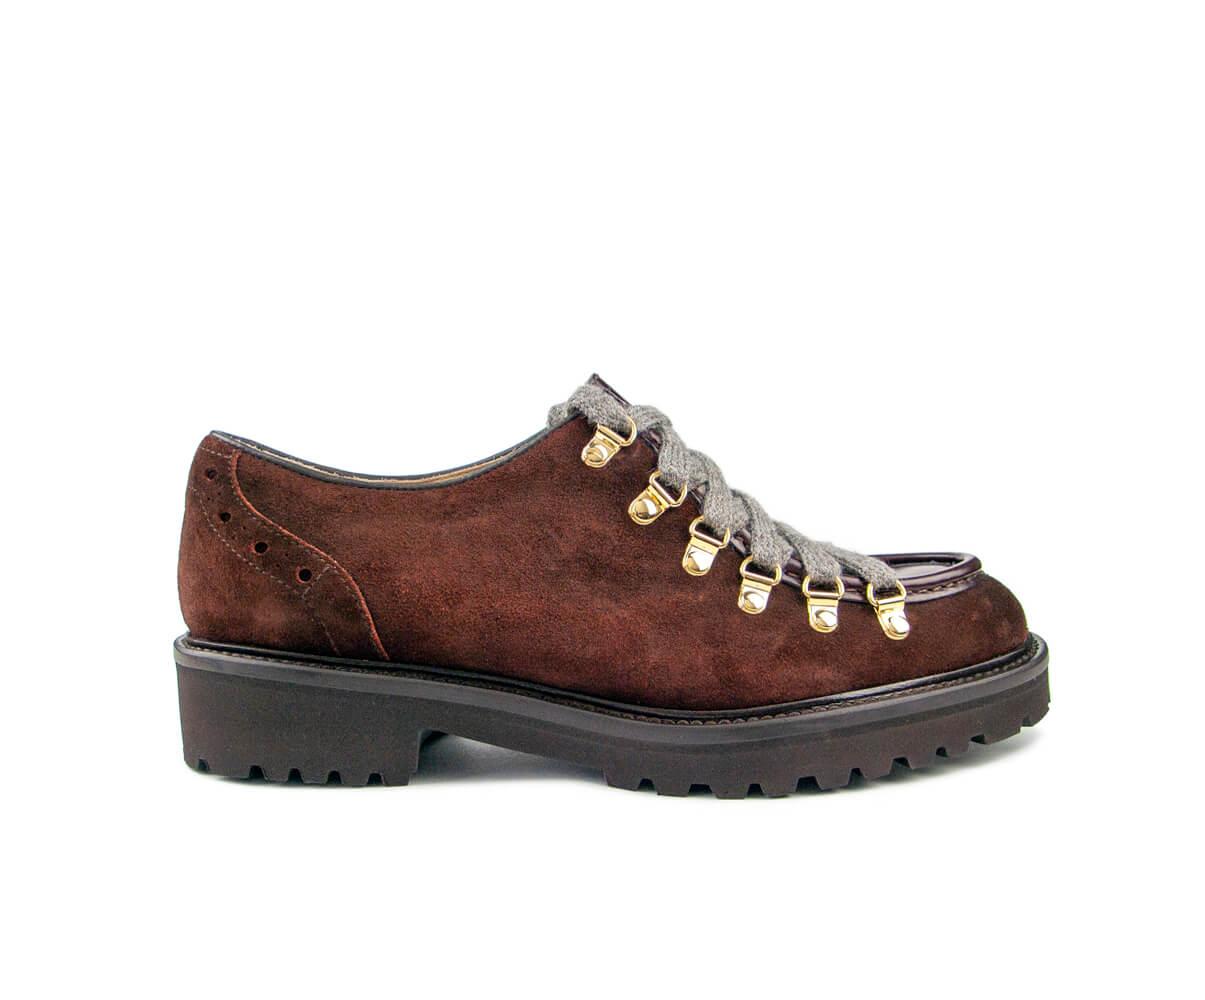 001 ecla scarpe rgb